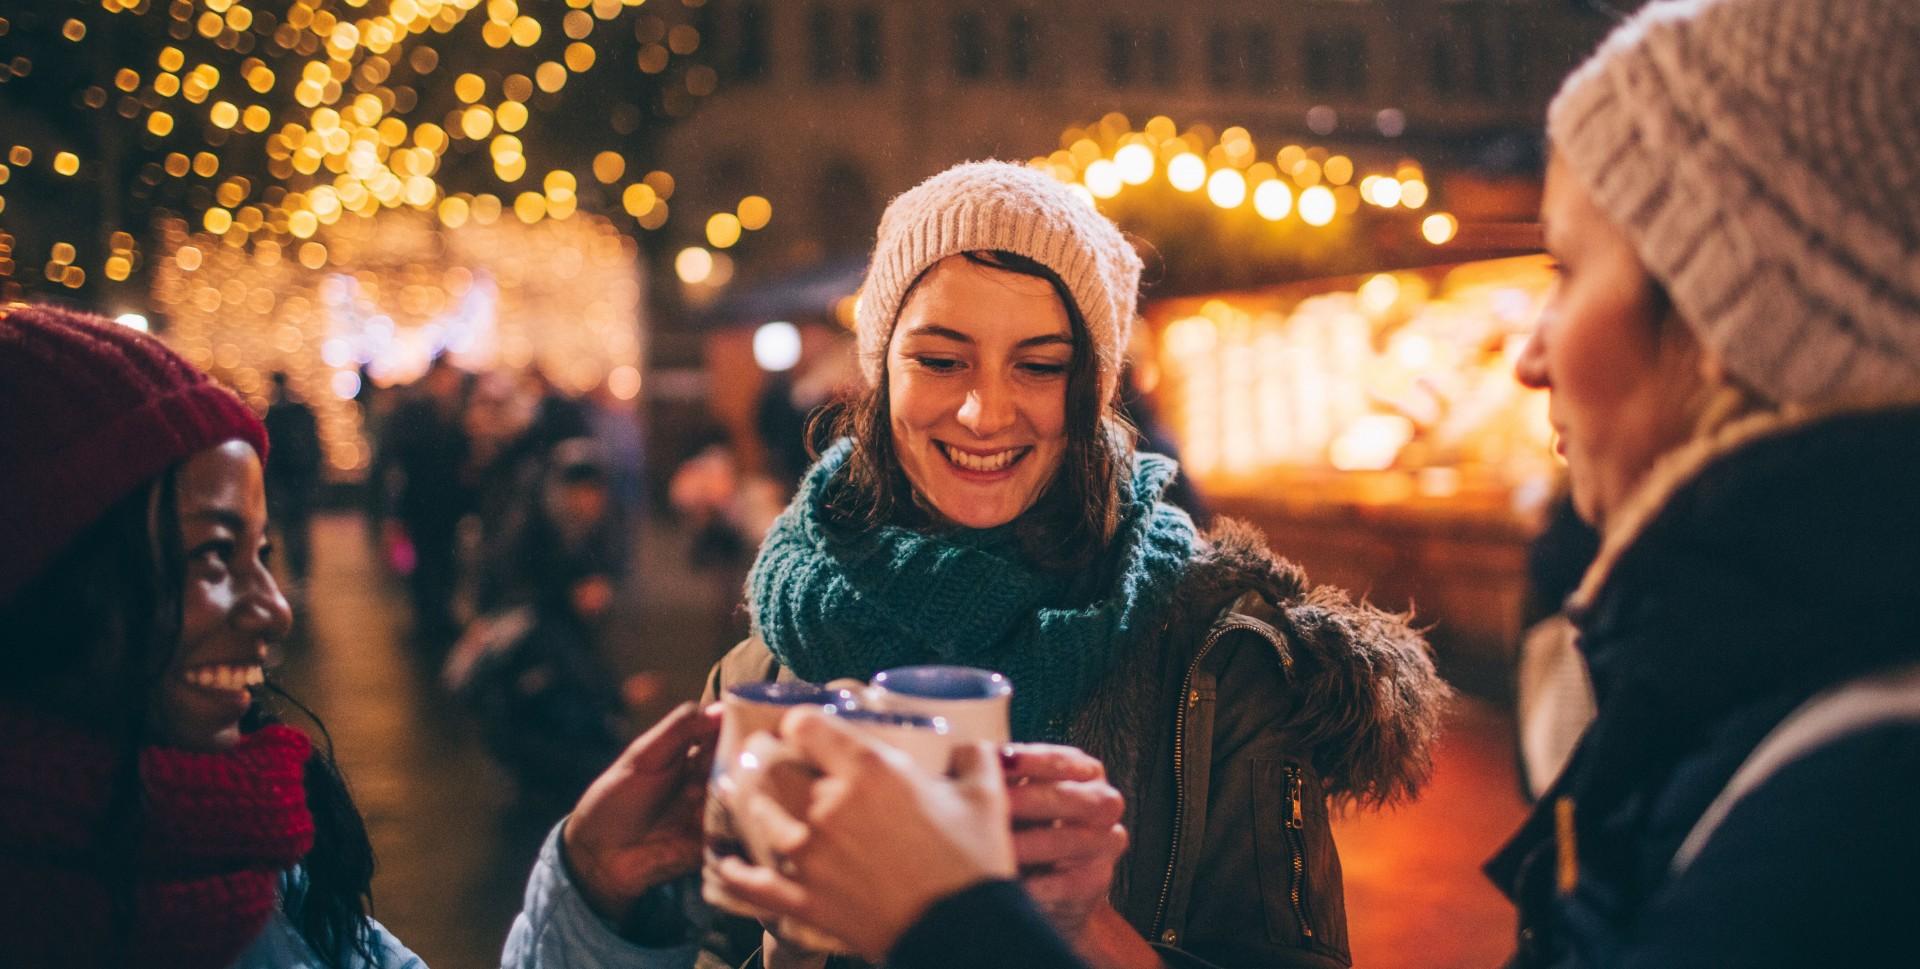 Mulled Wine Christmas Market.Festive Christmas Markets To Kick Off The Holiday Season